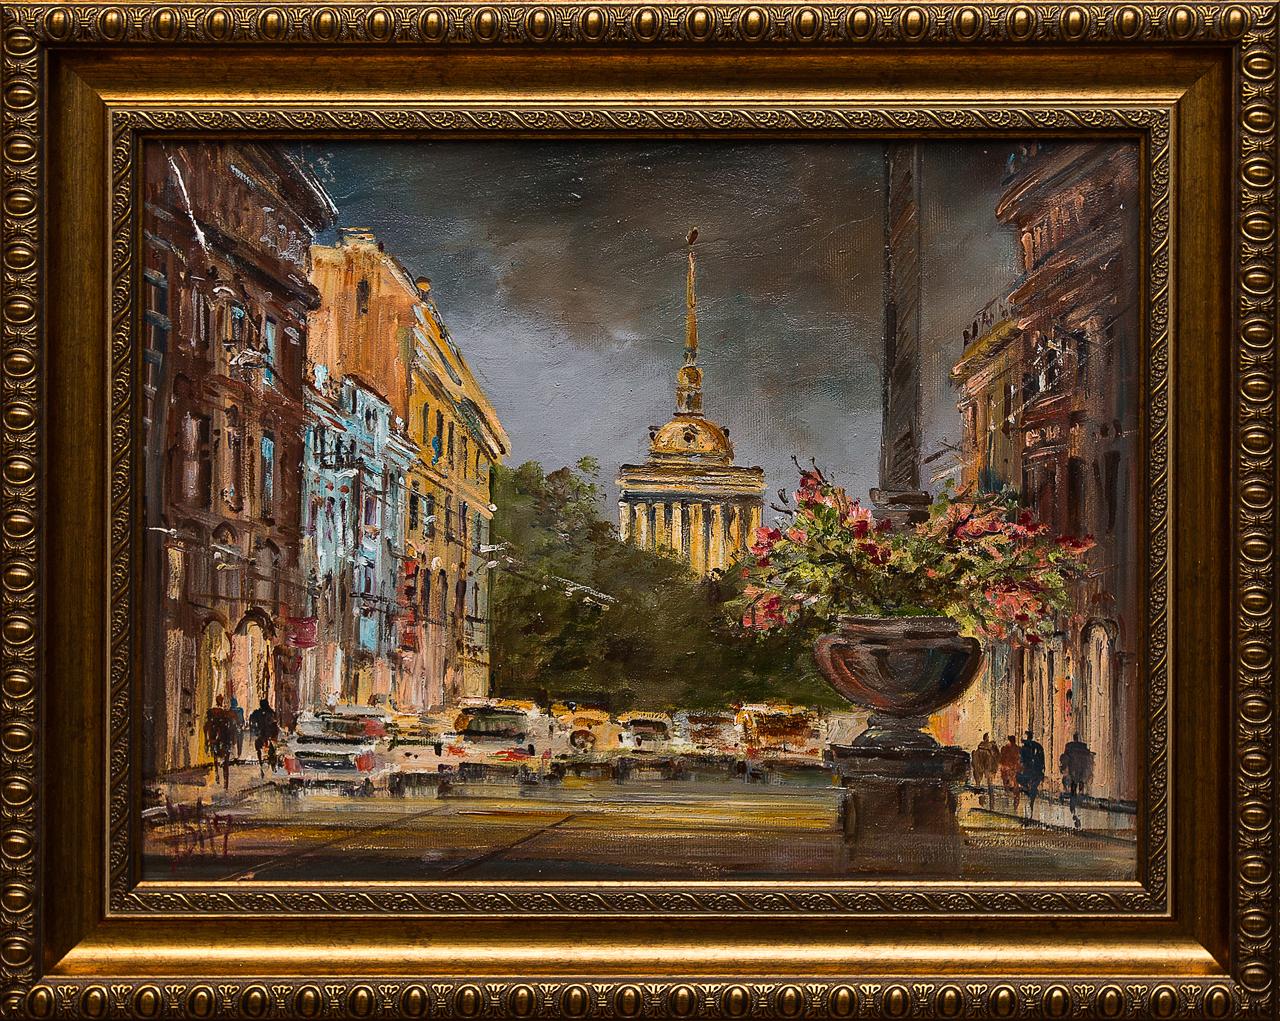 Картина масло Шумный город Шеренкова картина масло шумный город шеренкова